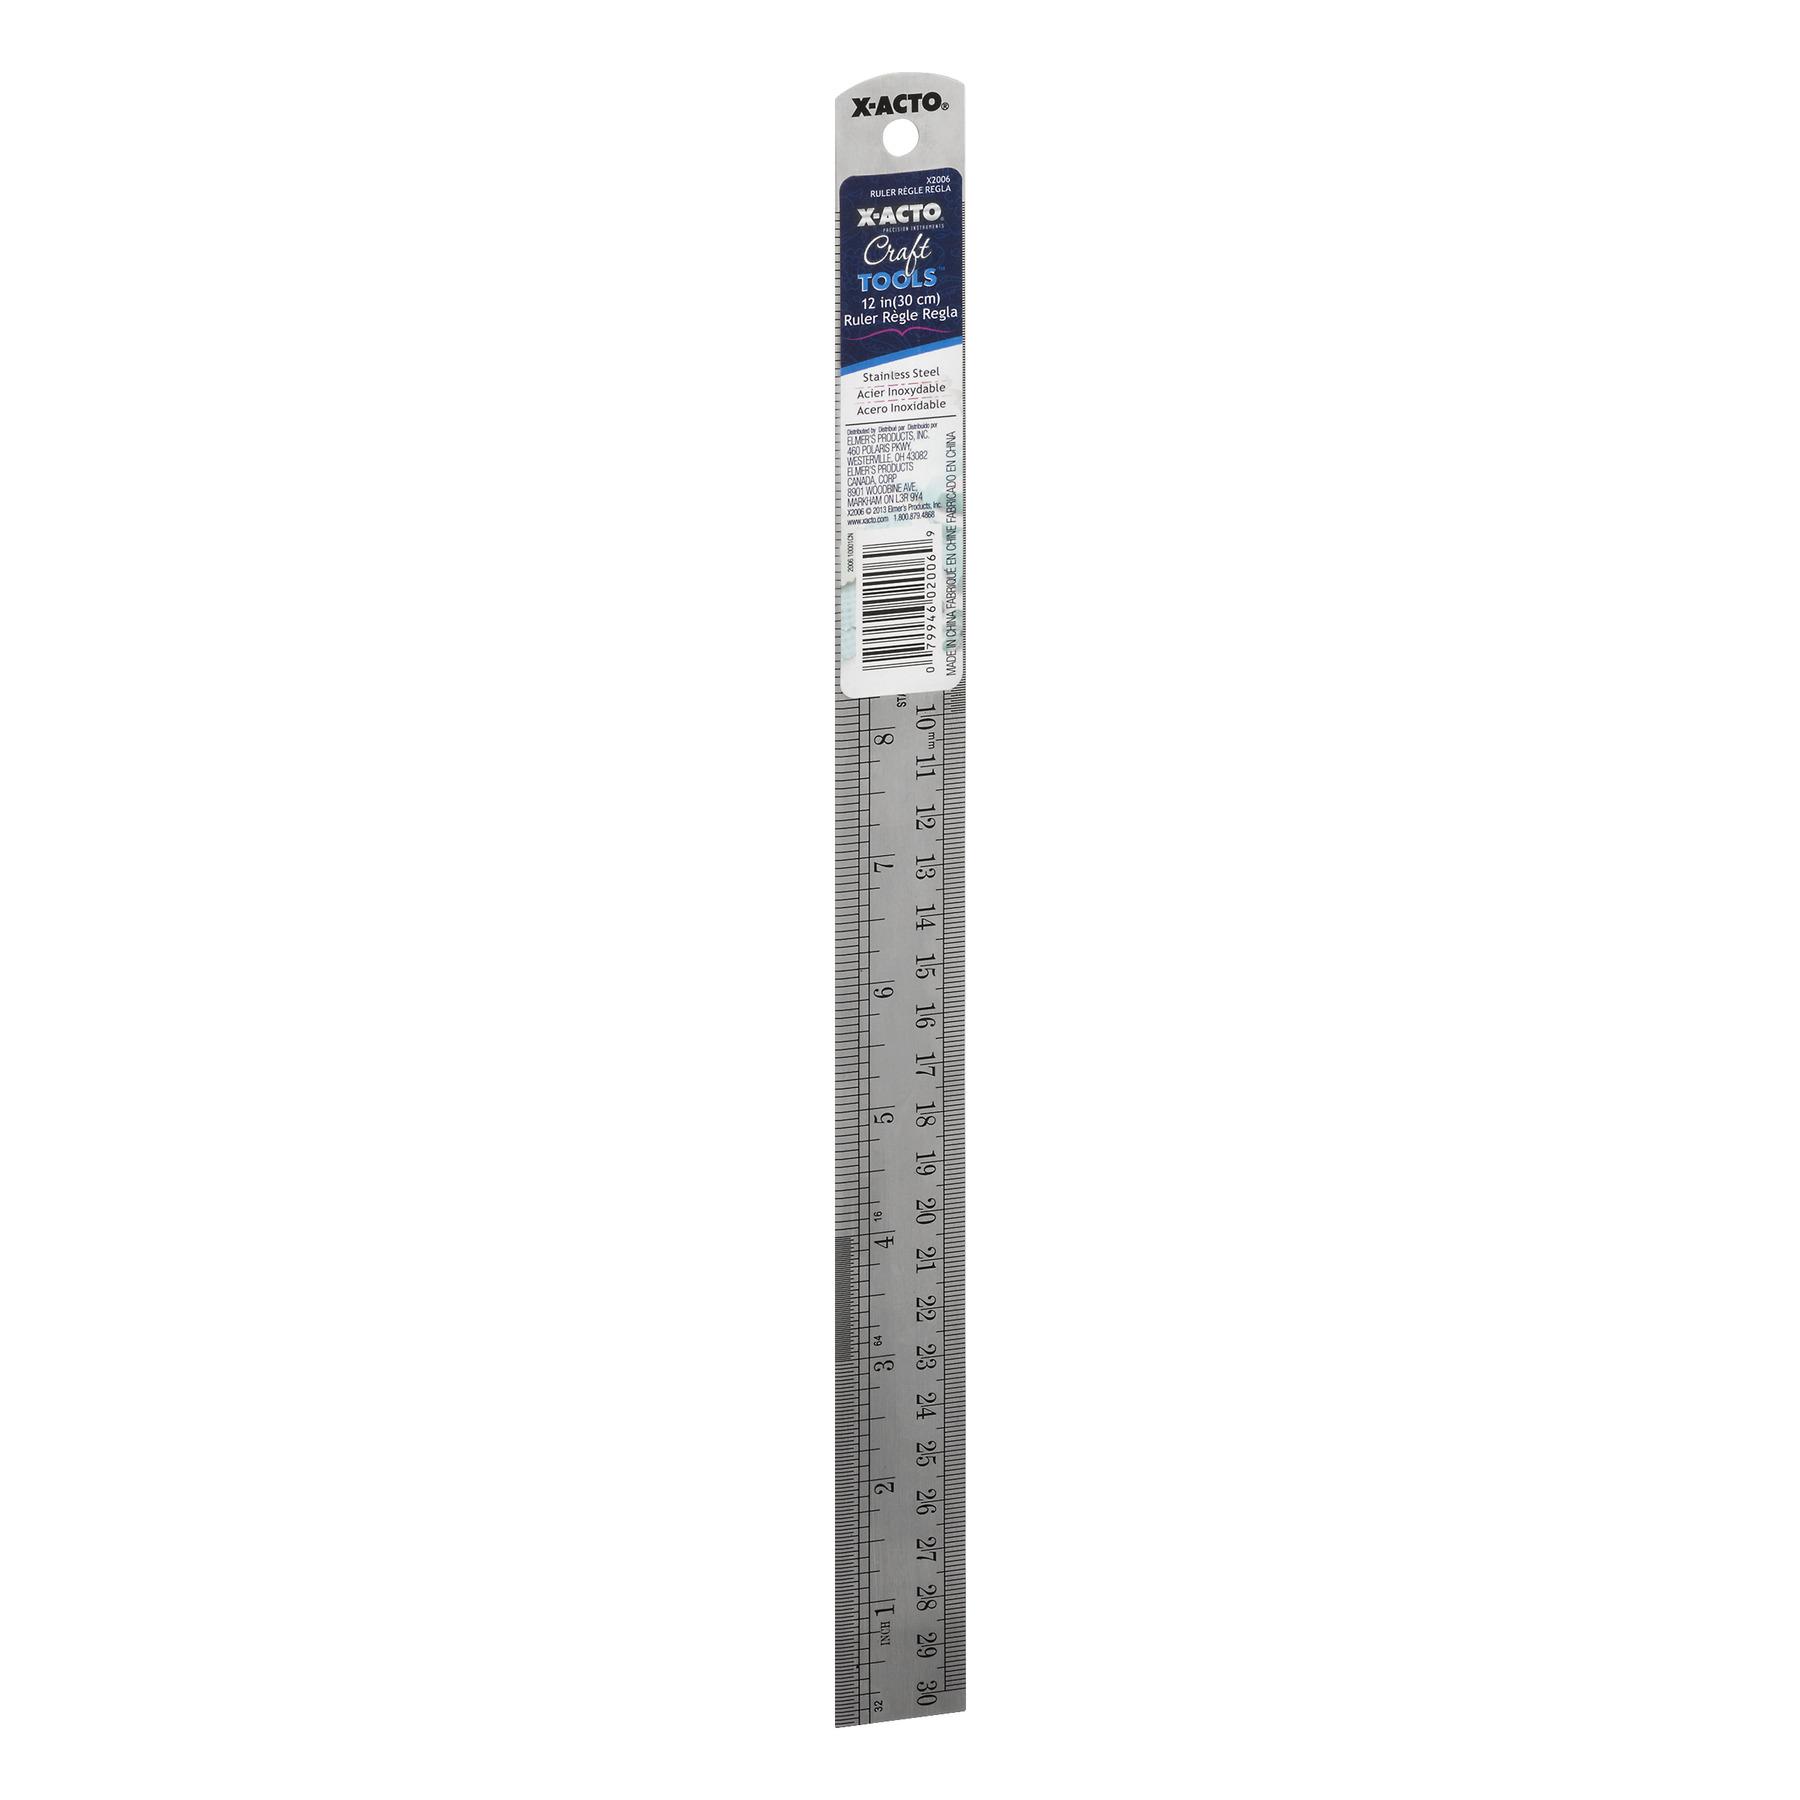 X-ACTO X2006W24 Designer Series Decorative Metal Ruler, 12-Inch $1.98 add-on item @amazon